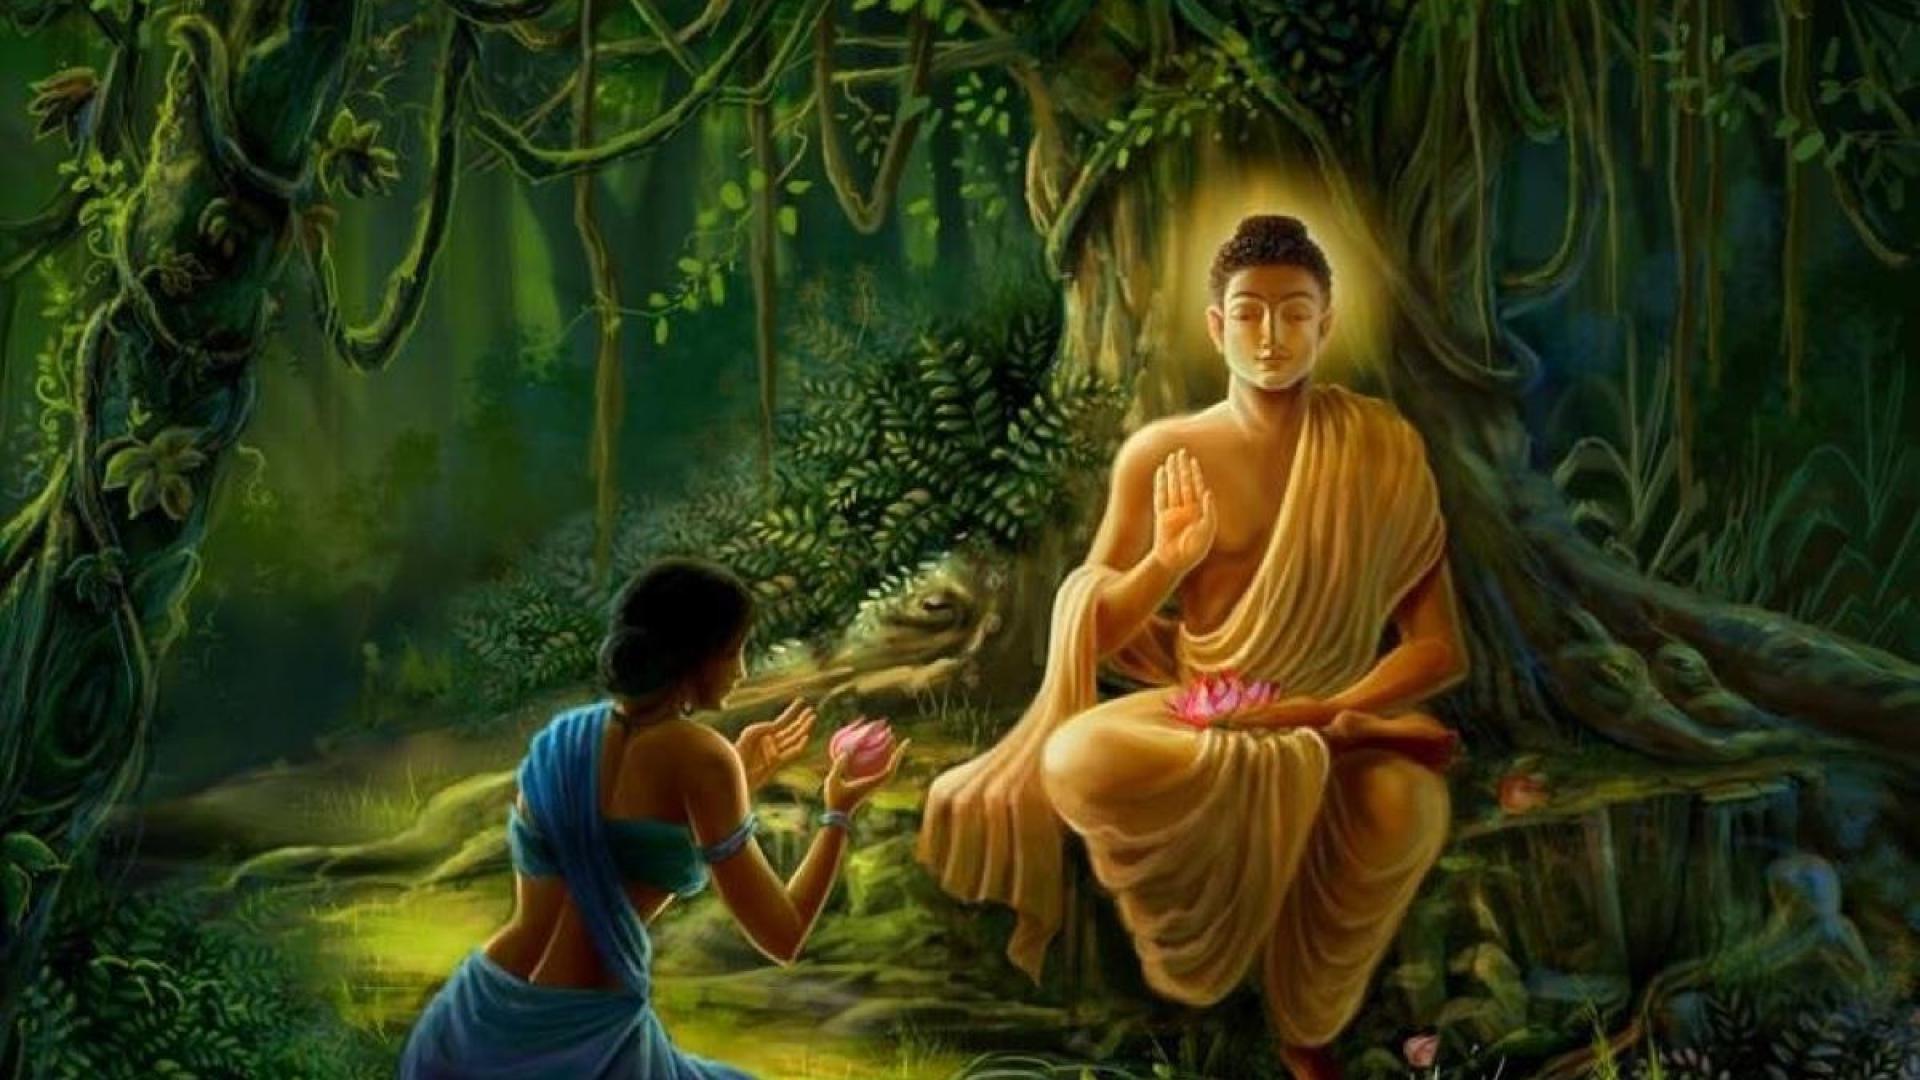 Wallpapers For > Buddhist Wallpaper Art